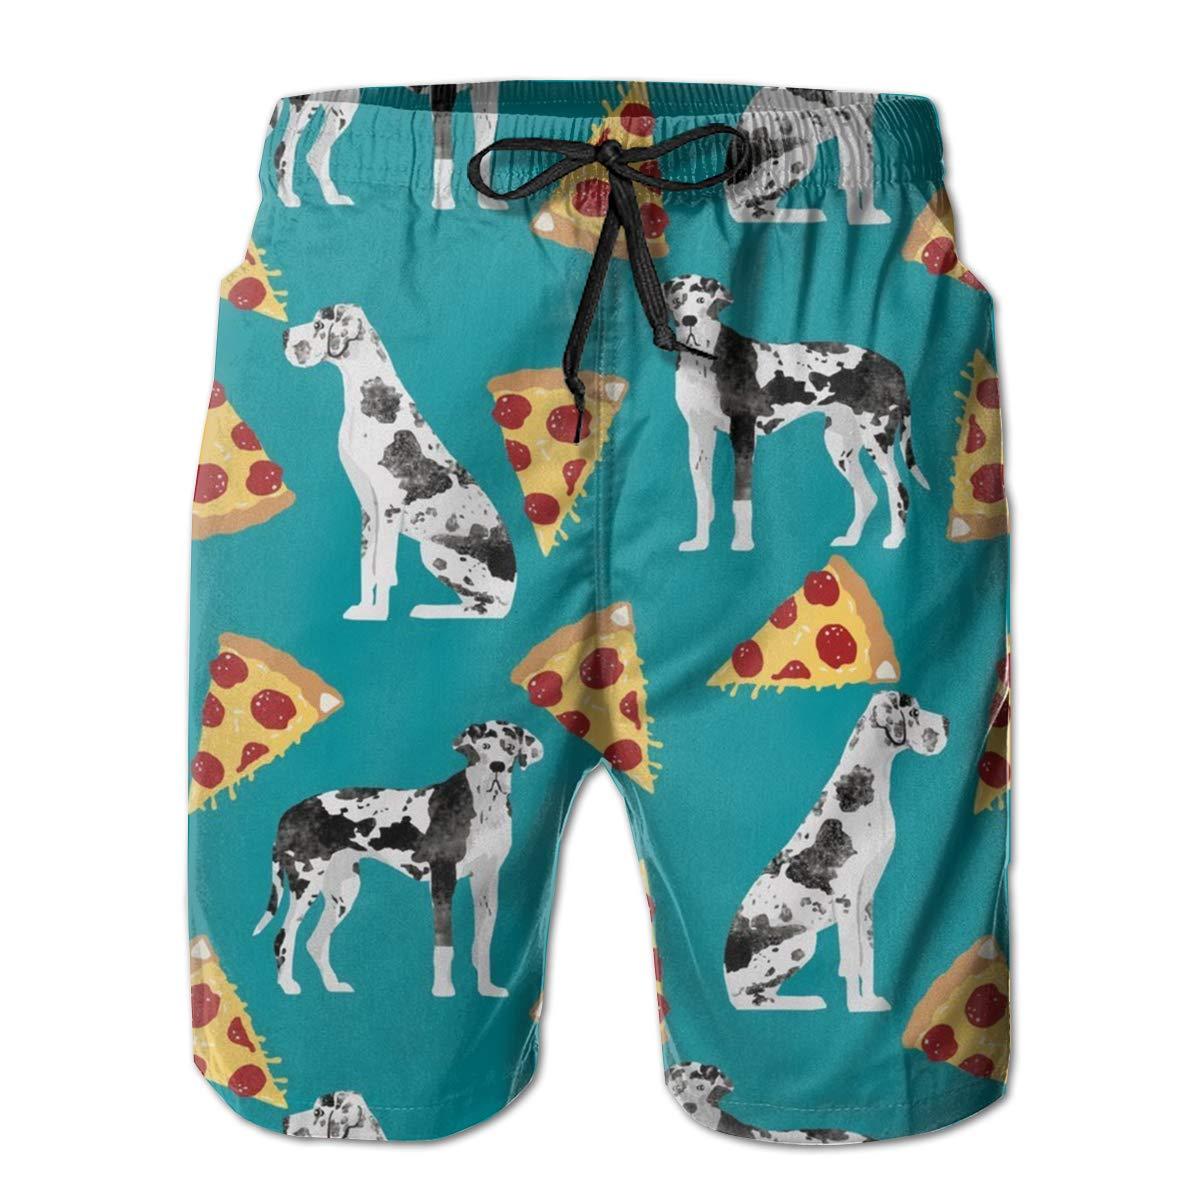 Loose Underwear FANTASY SPACE Extreme Comfort Cargo Short Big /&Tall Board Shorts for Men Boy